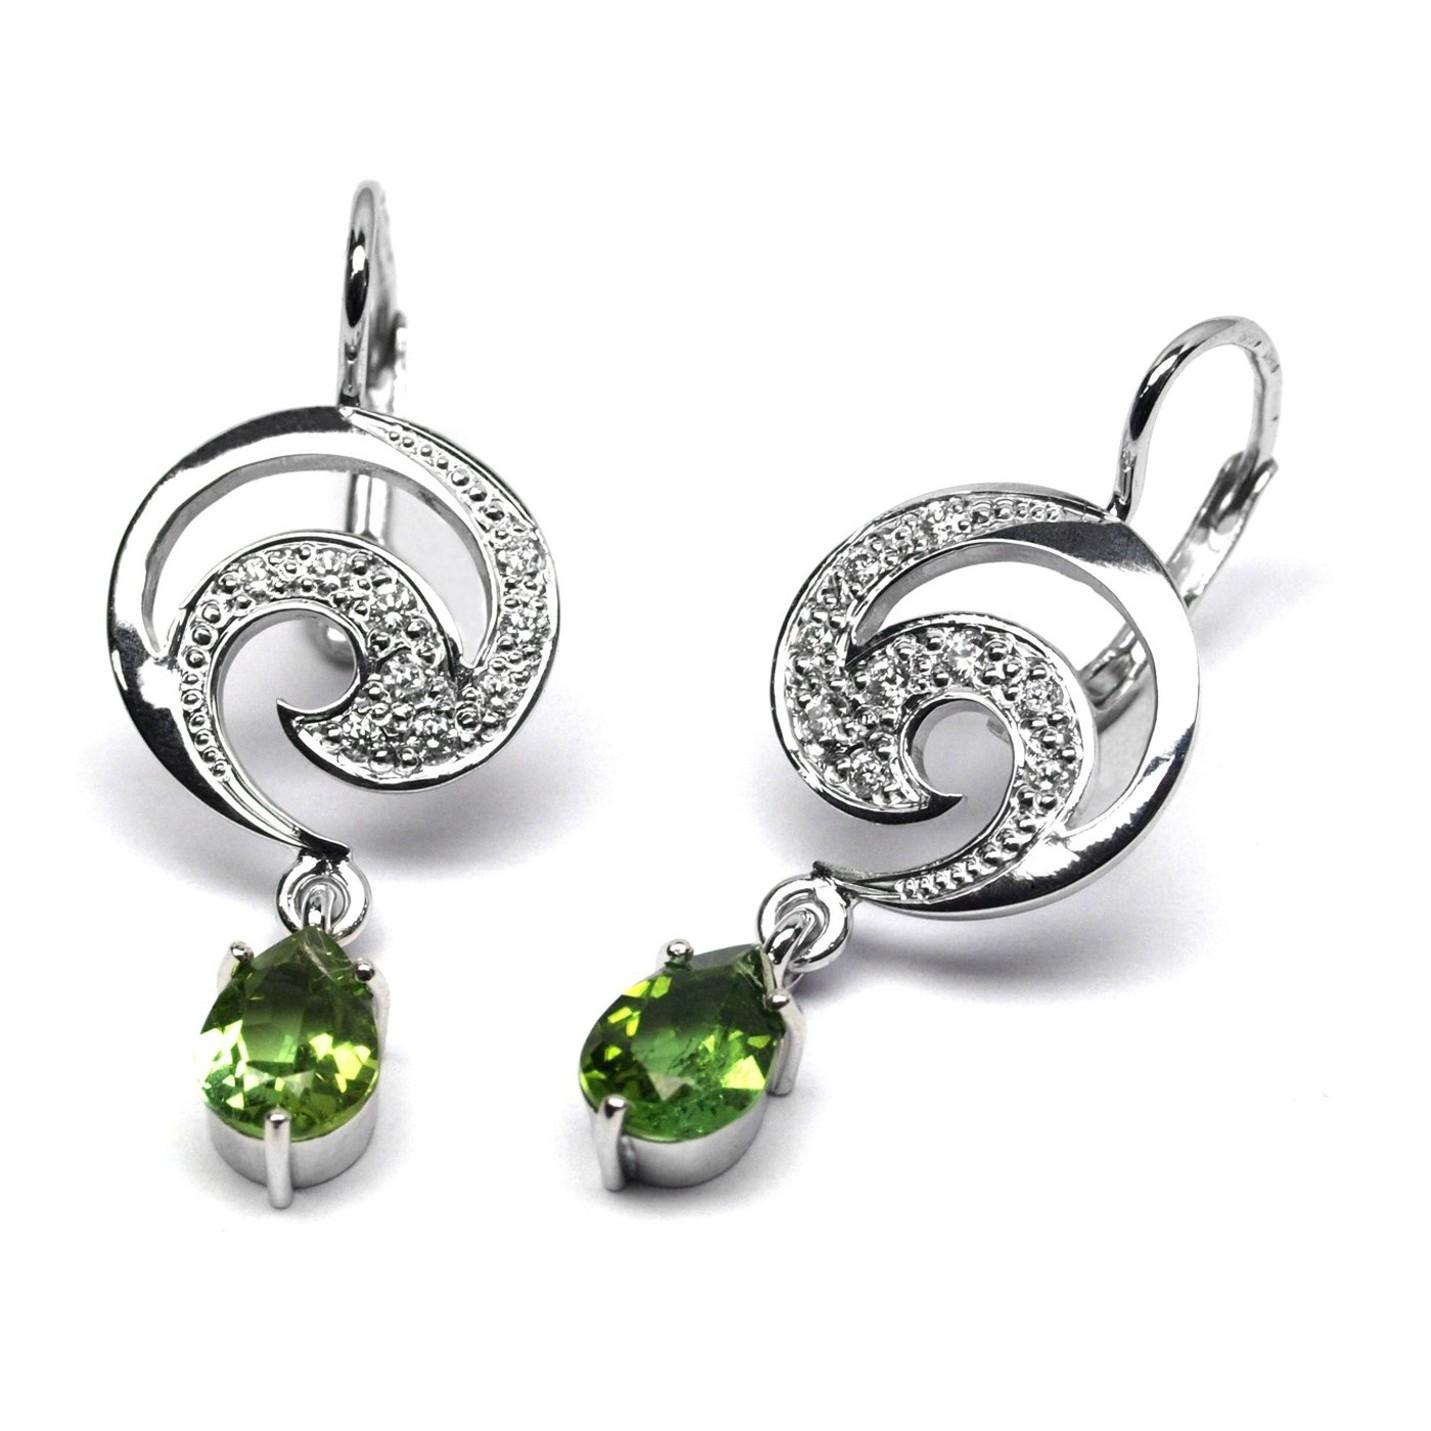 Diamantové zlaté náušnice s turmalíny a diamanty J-28496-17 (J-28496-17 - POŠTOVNÉ ZDARMA!!)